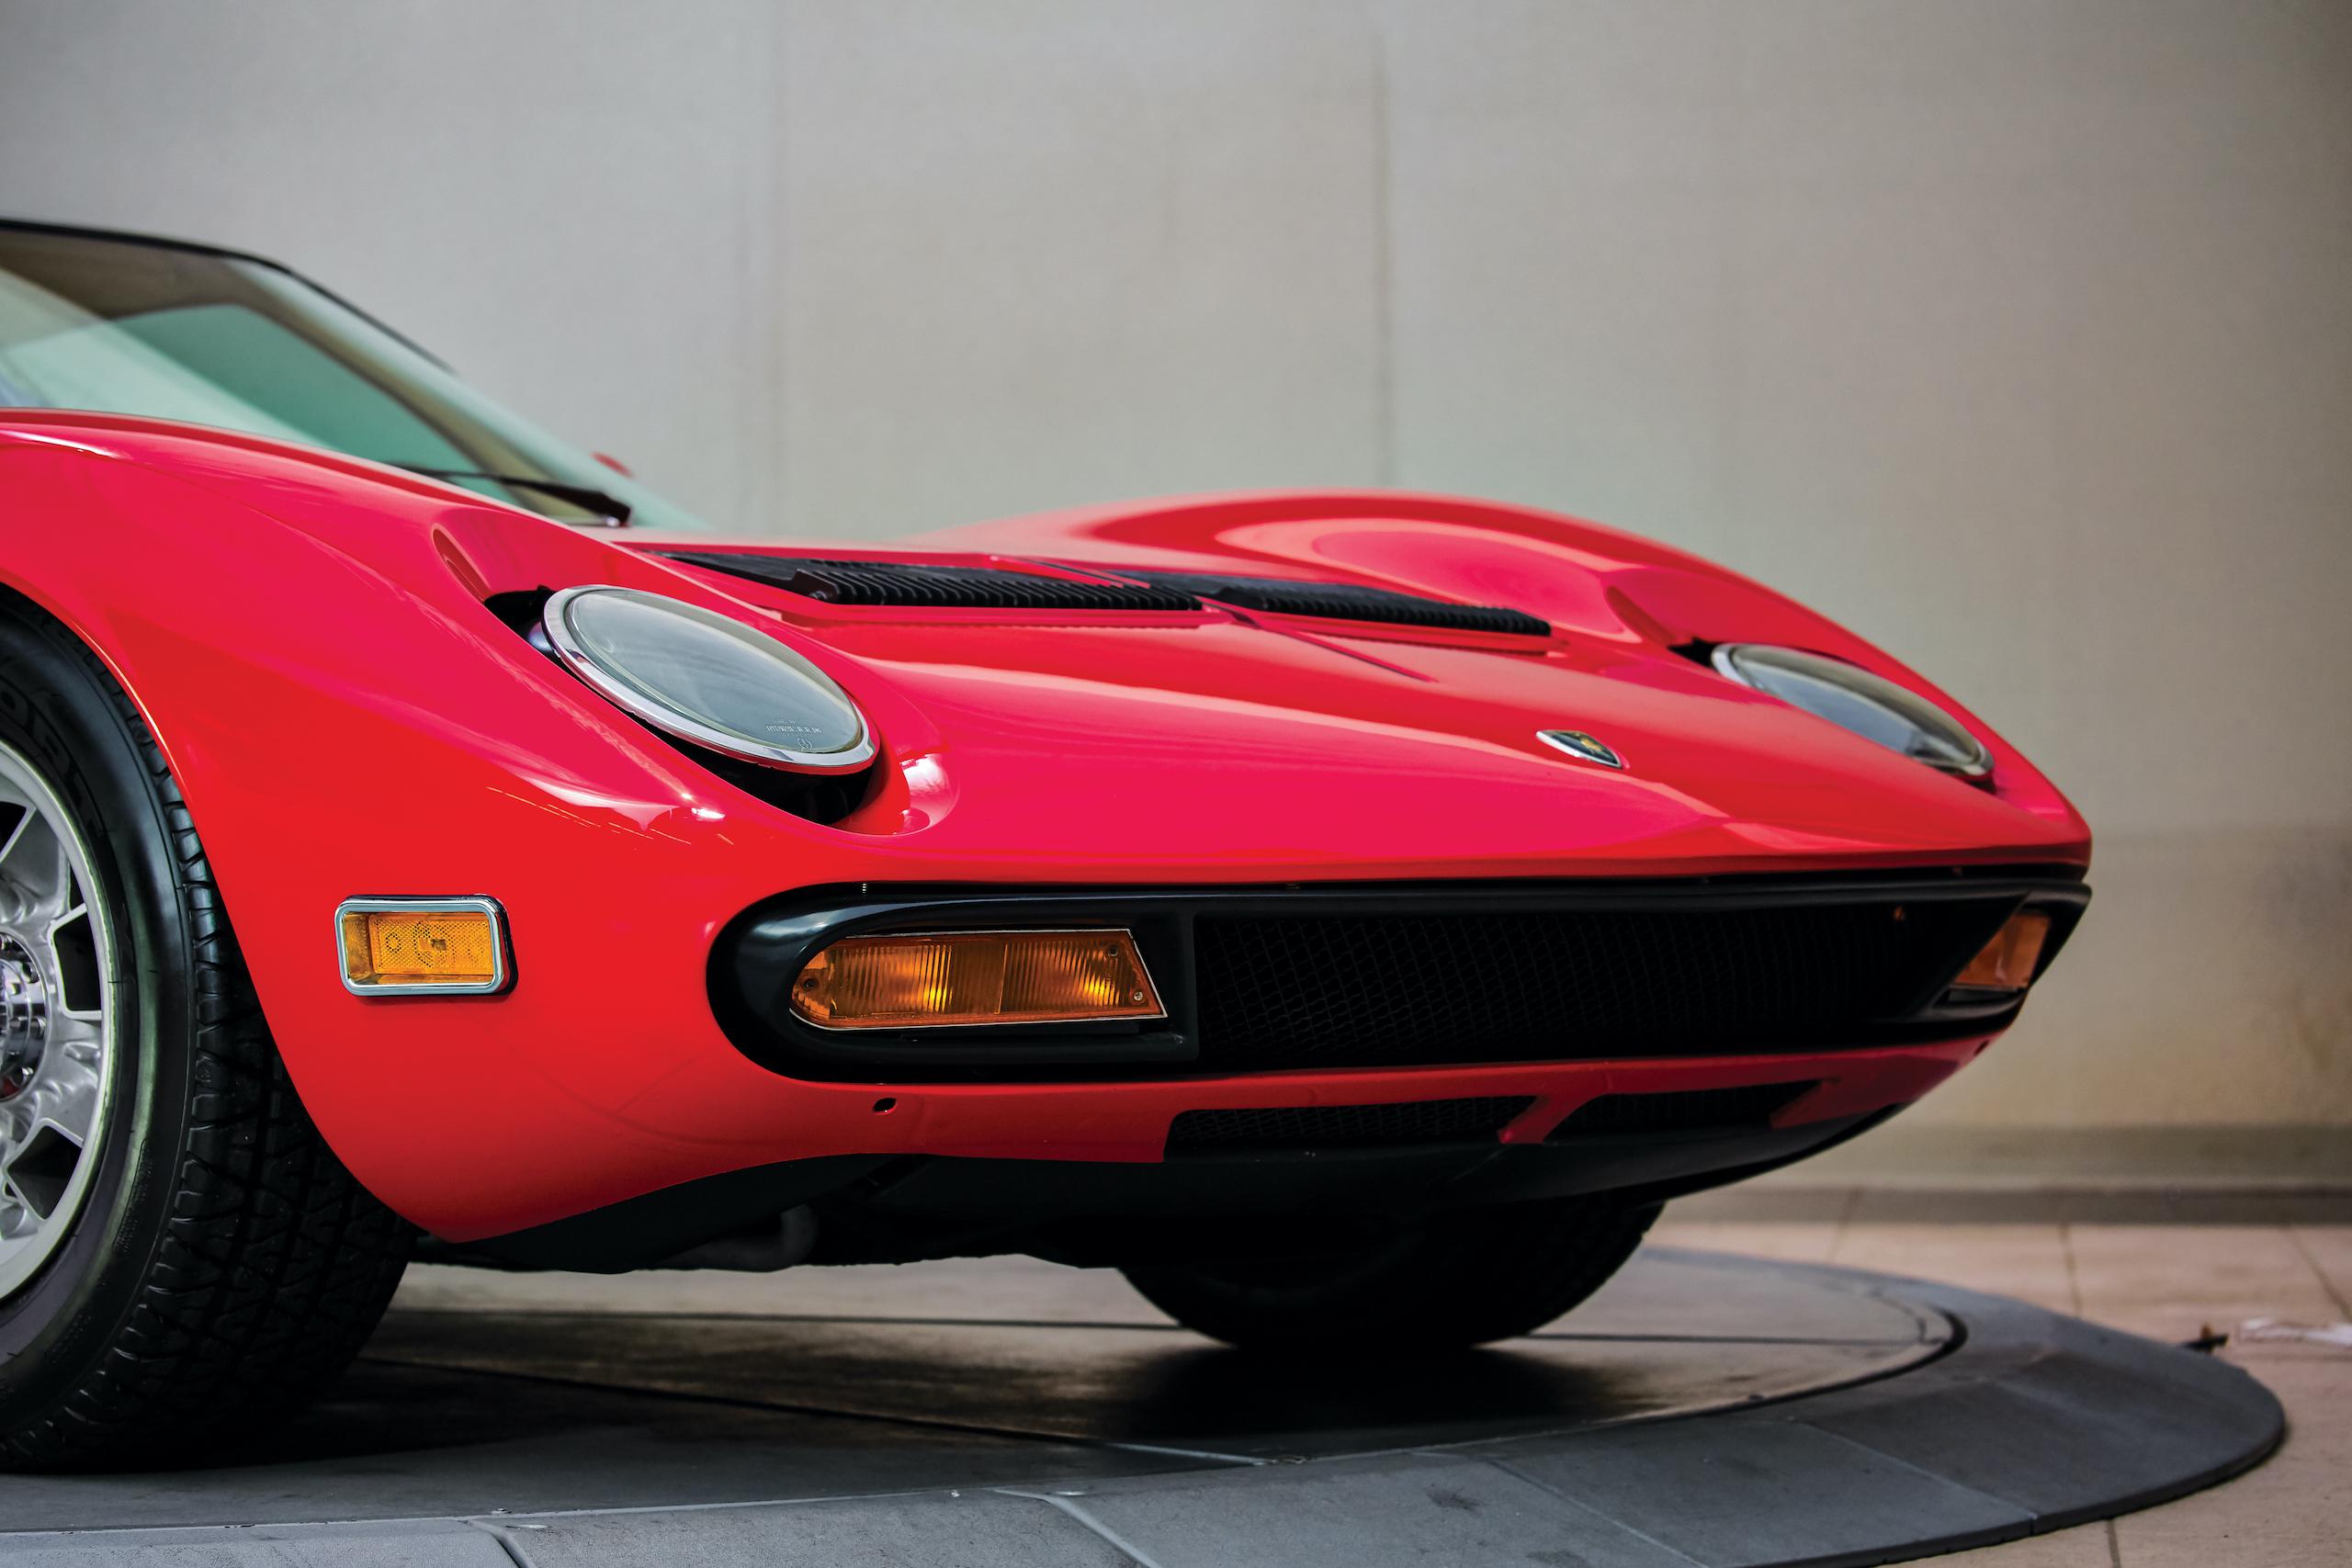 1971 Lamborghini Miura P400 SV front fascia